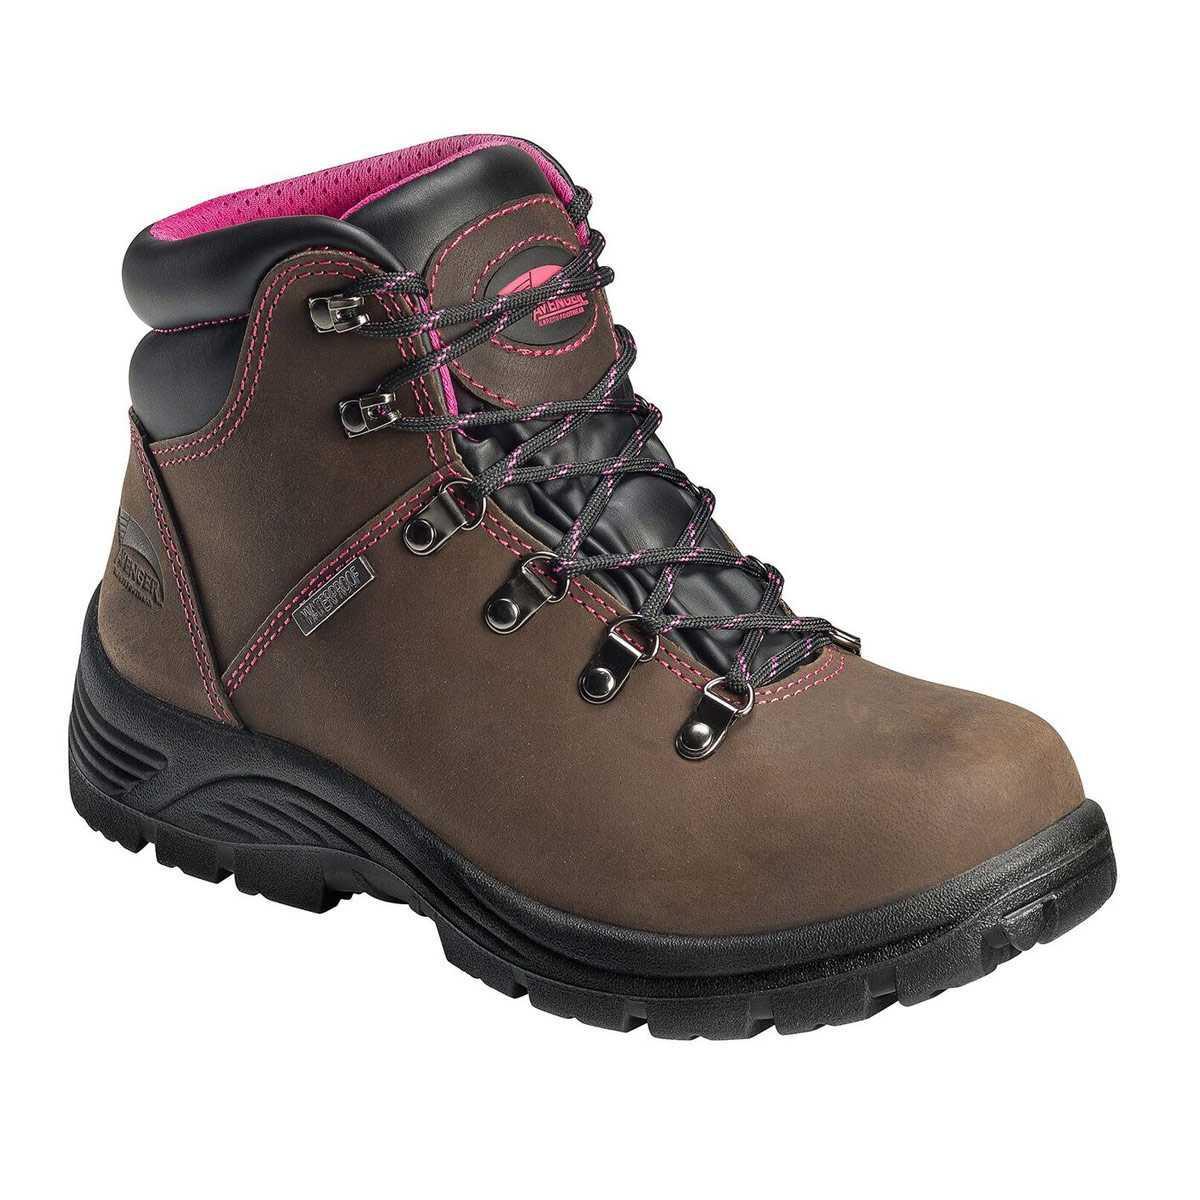 Avenger Women's Brown/Pink Steel Toe Waterproof Hiker - A7125-csgbotw1000044884_-00_avenger-womens-brown-pink-steel-toe-waterproof-hiker.jpg